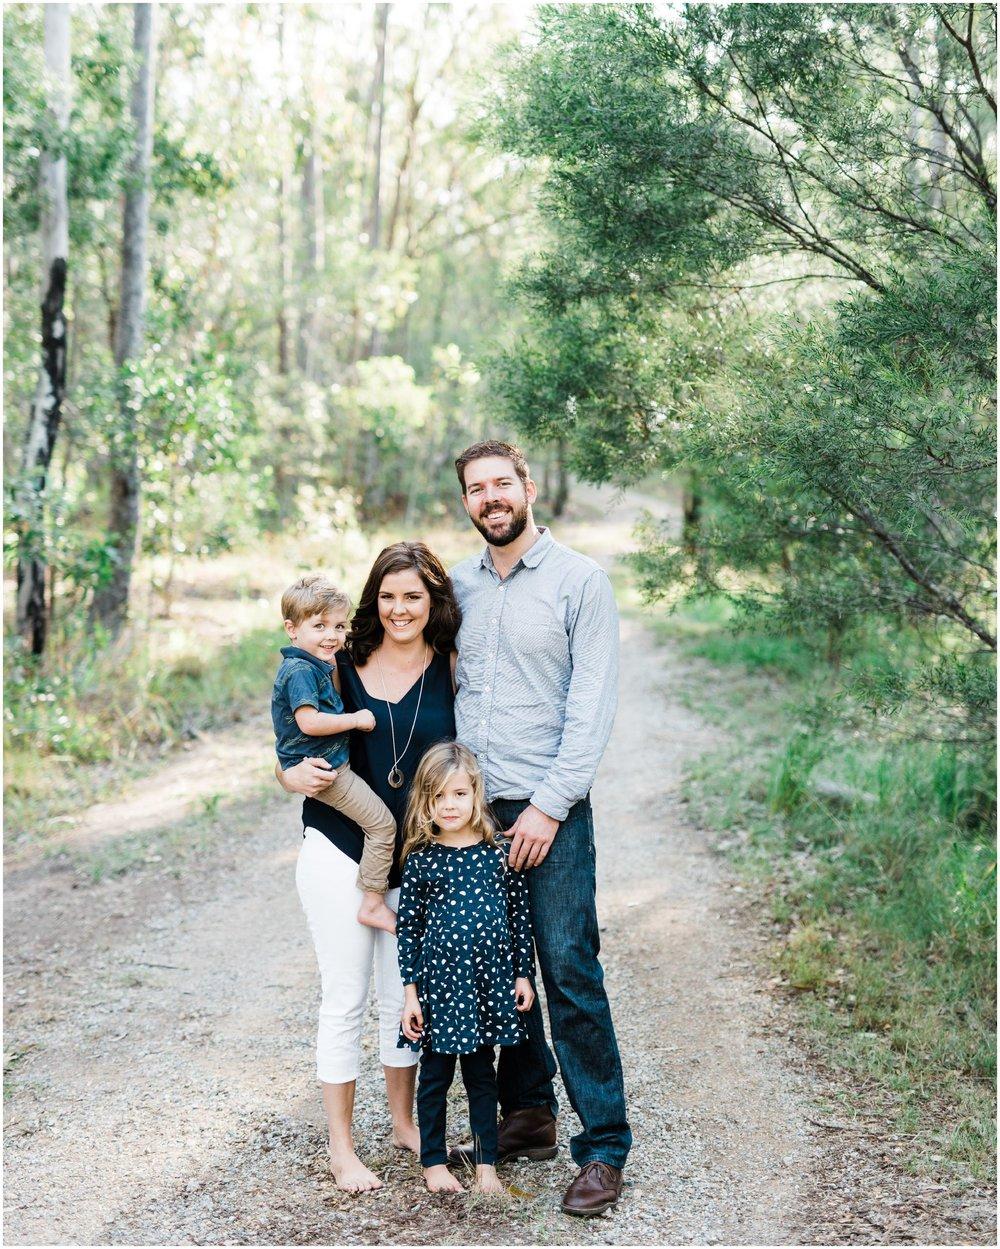 Brisbane-Family-Lifestlye-Photography-Home1.jpg